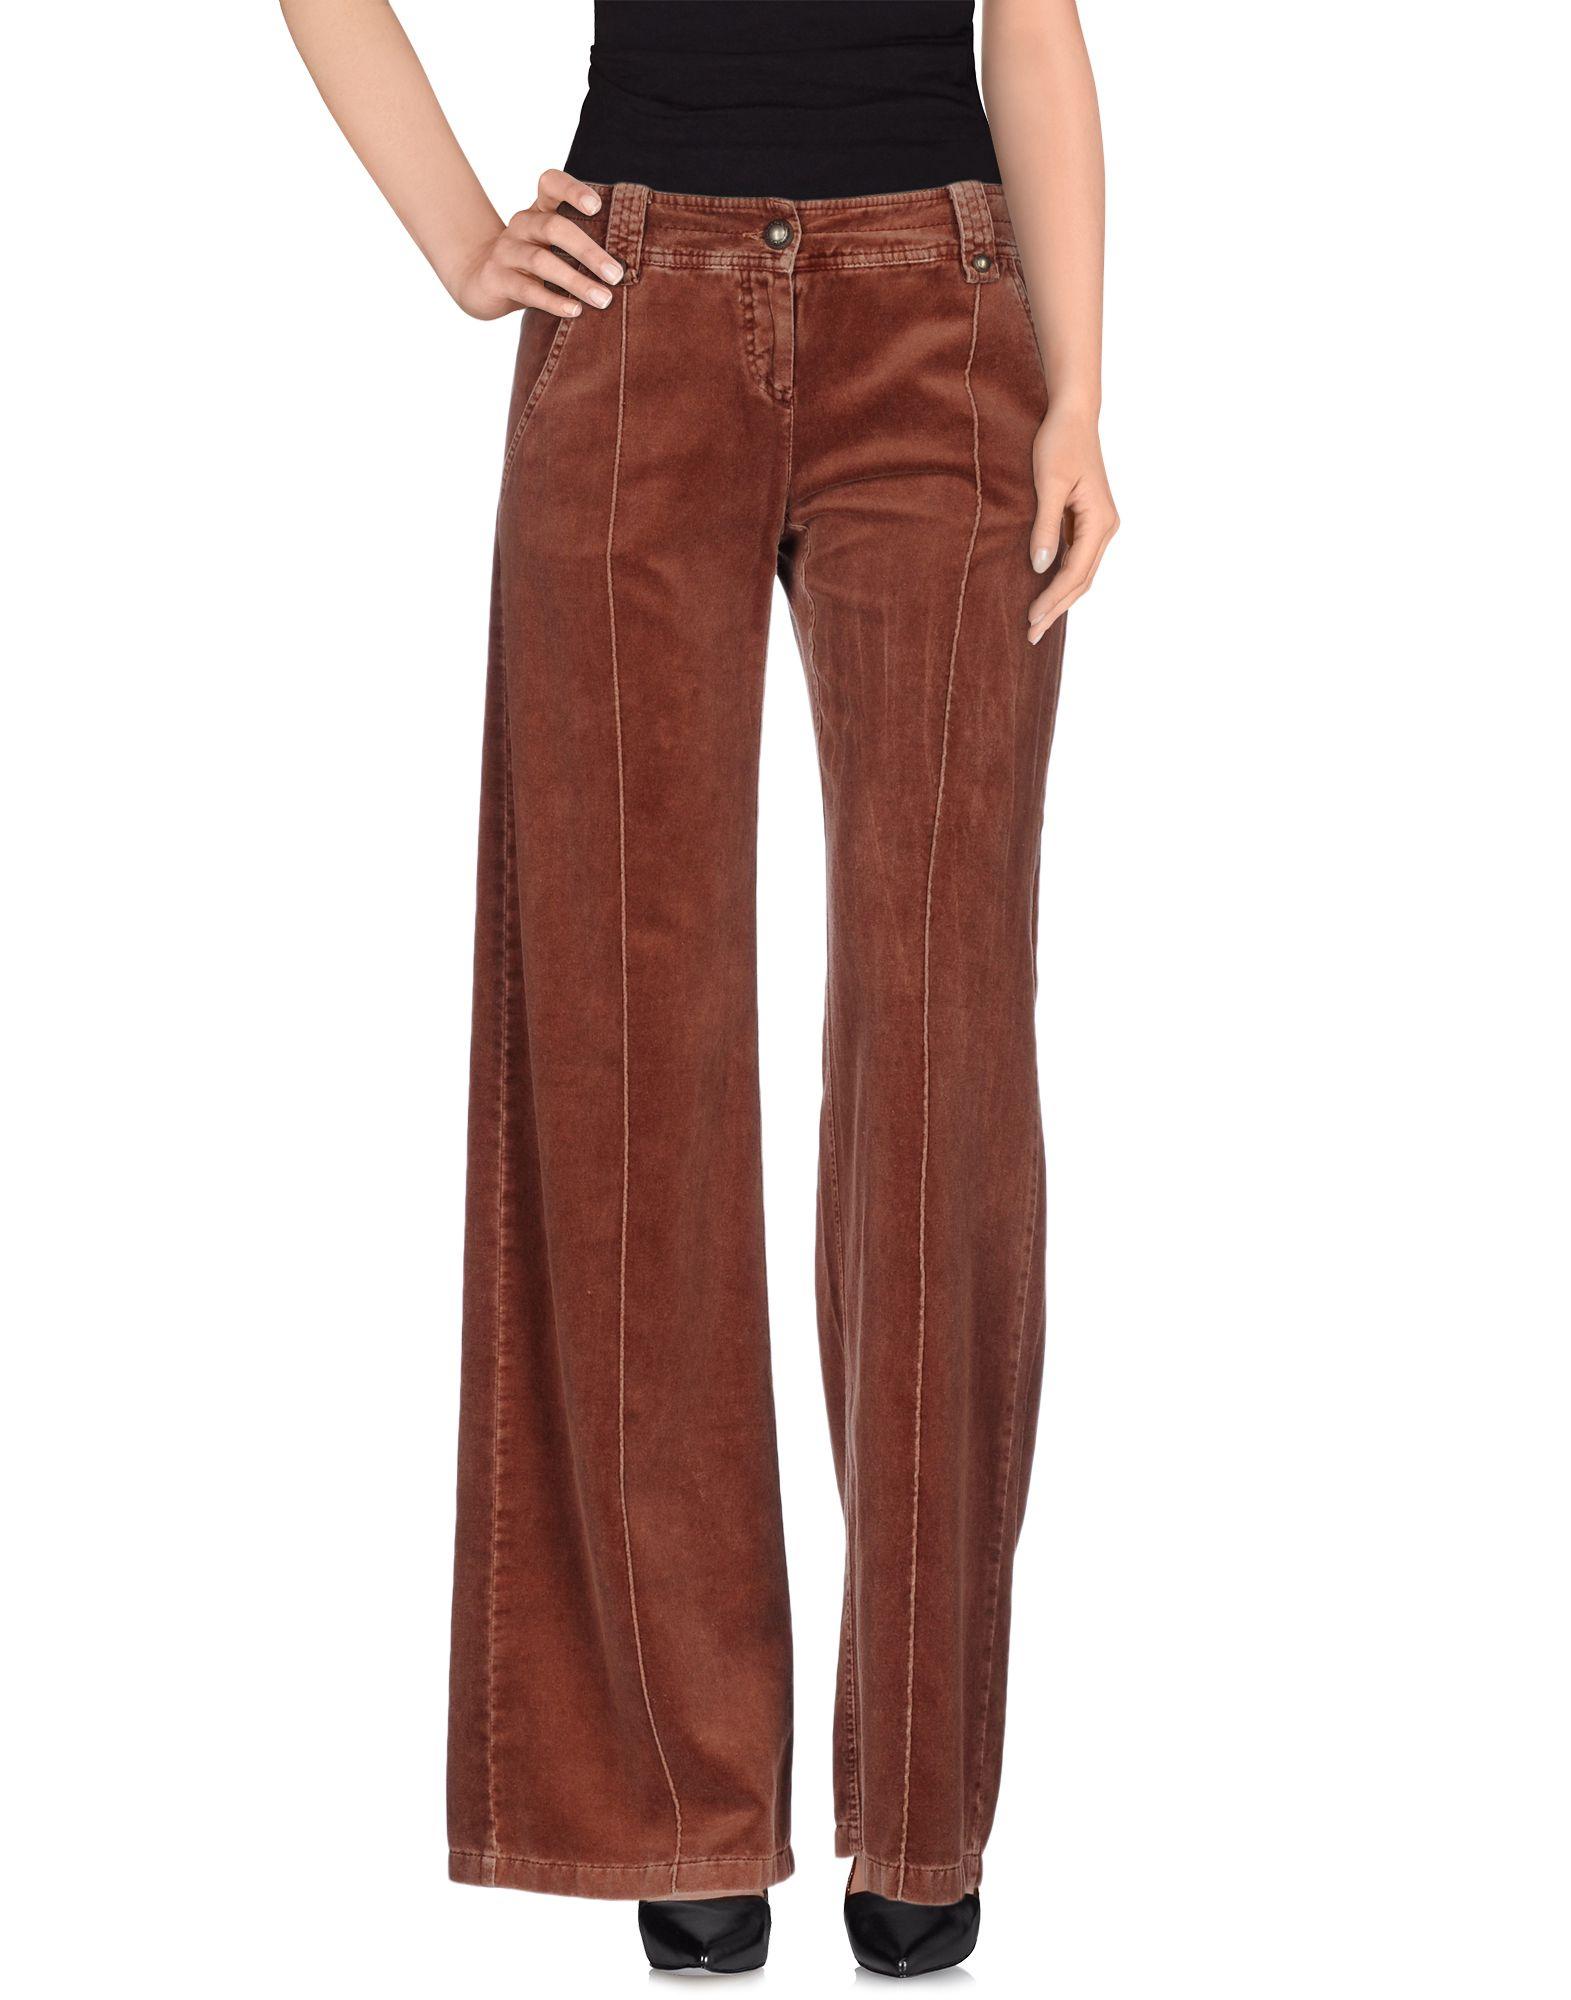 PATRIZIA PEPE - PANTALONS - Pantalons